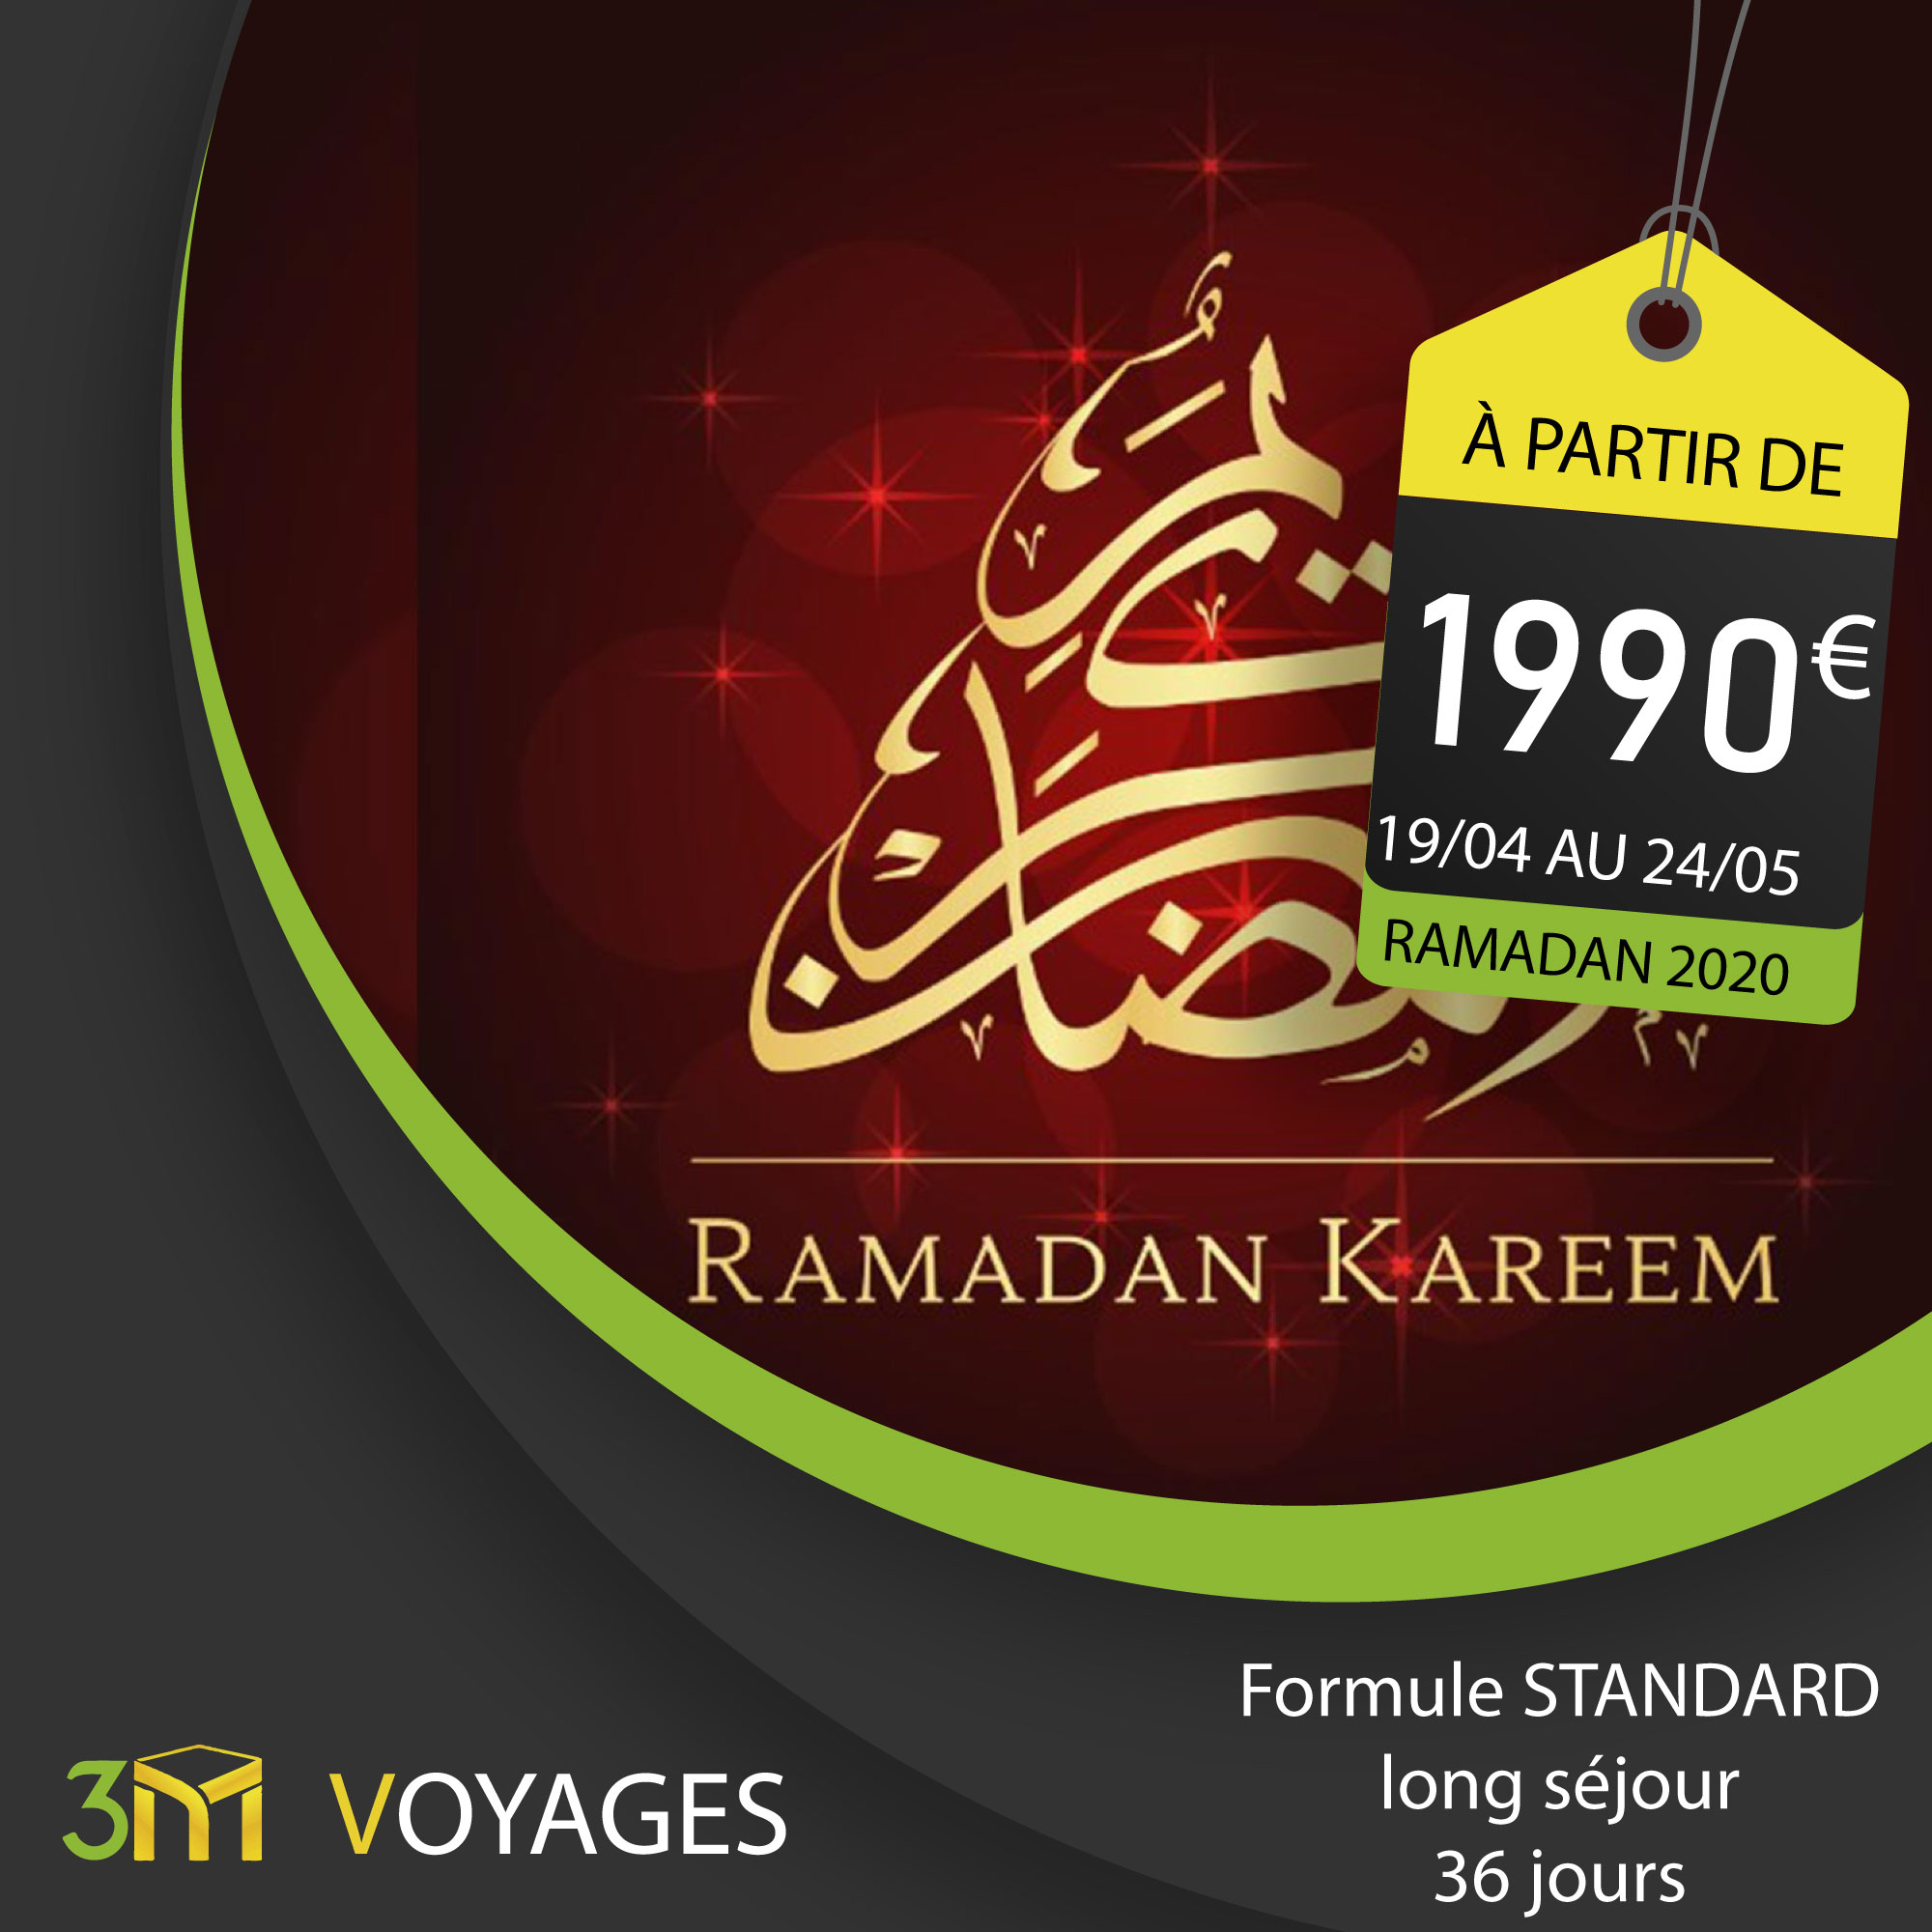 Calendrier Ramadan Lyon 2020.Calendrier Ramadan 2020 Lyon